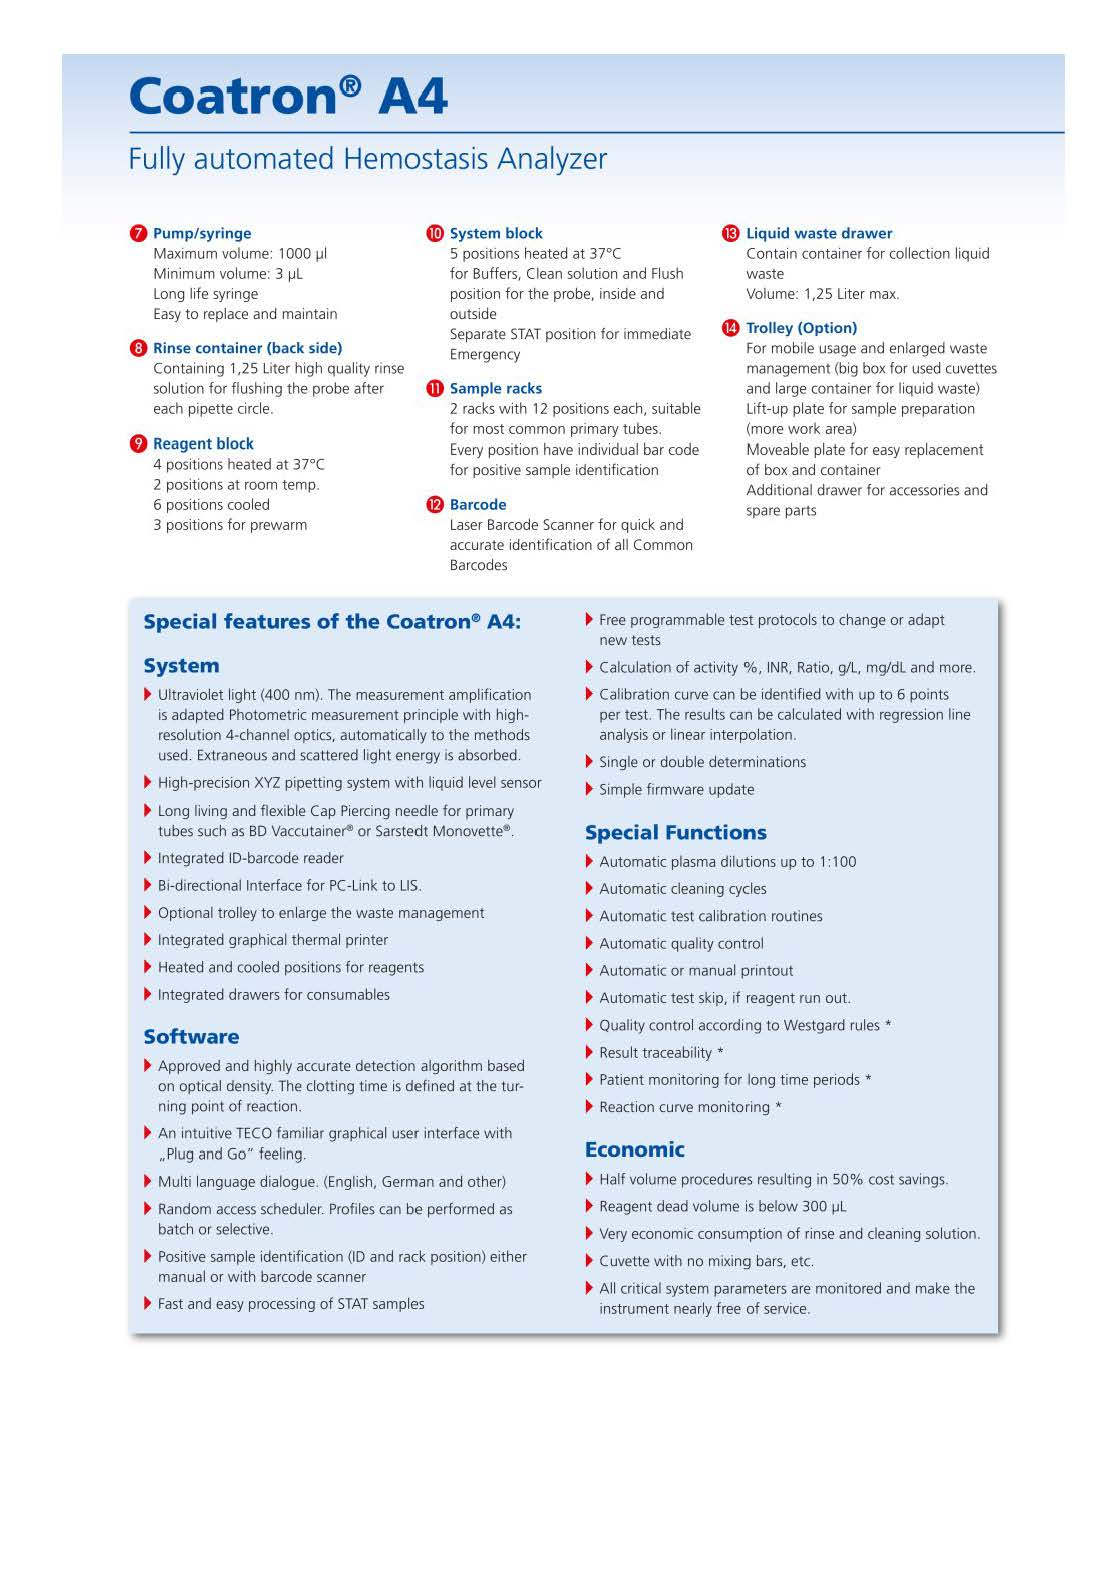 COATRON-A4_Pagina_5